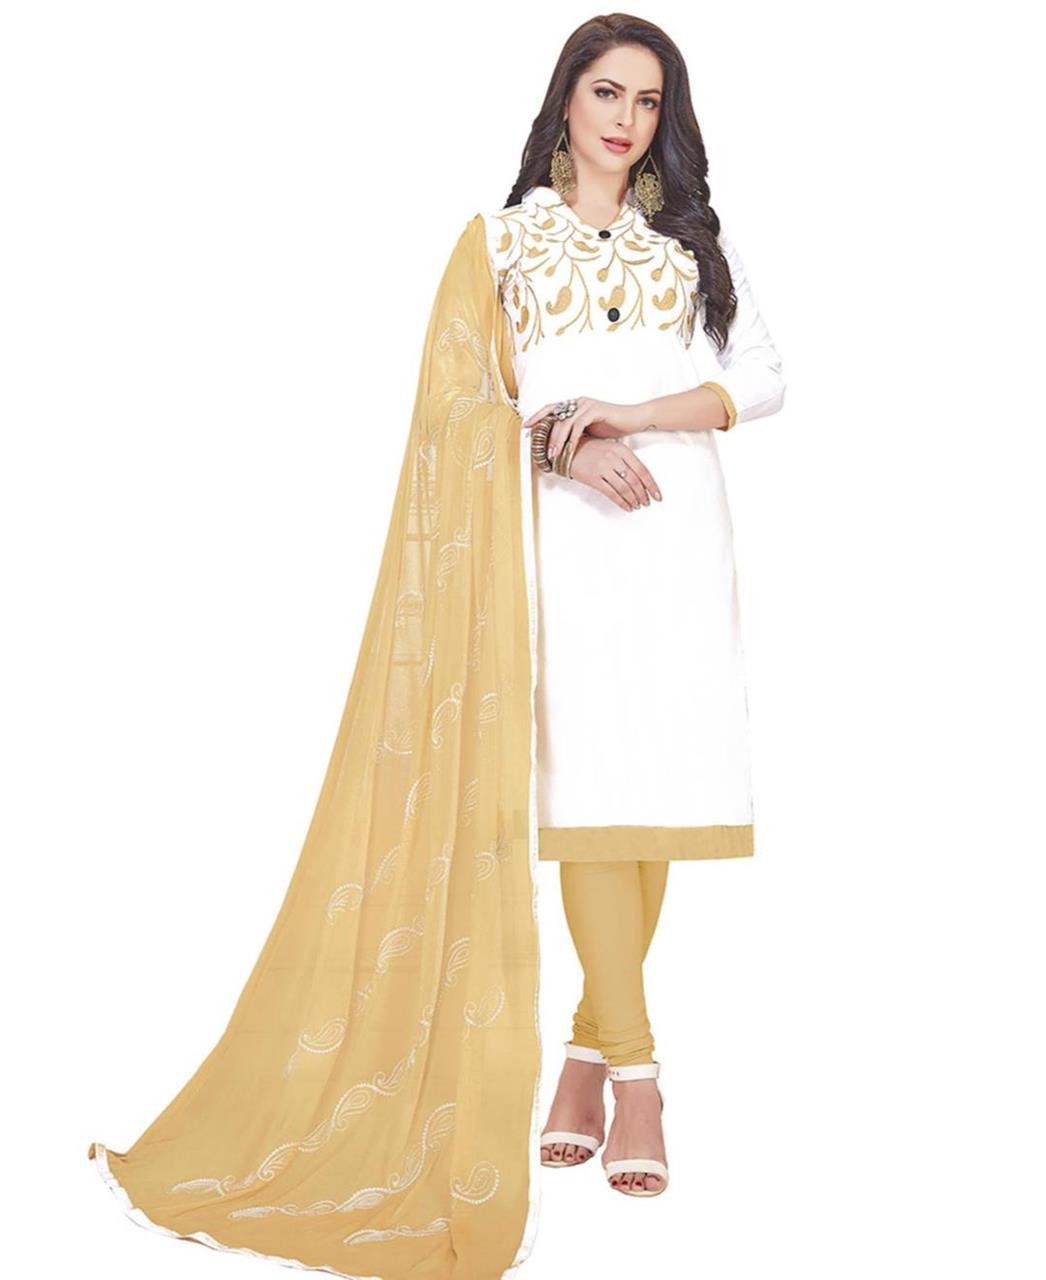 Embroidered Cotton White Straight Cut Salwar